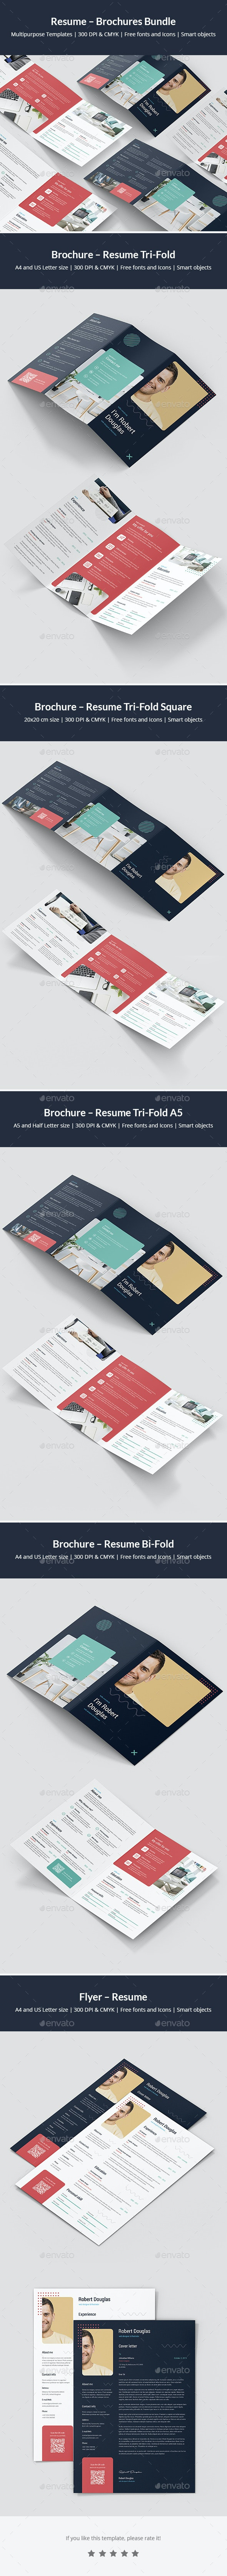 Resume – Brochures Bundle Print Templates 5 in 1 - Informational Brochures